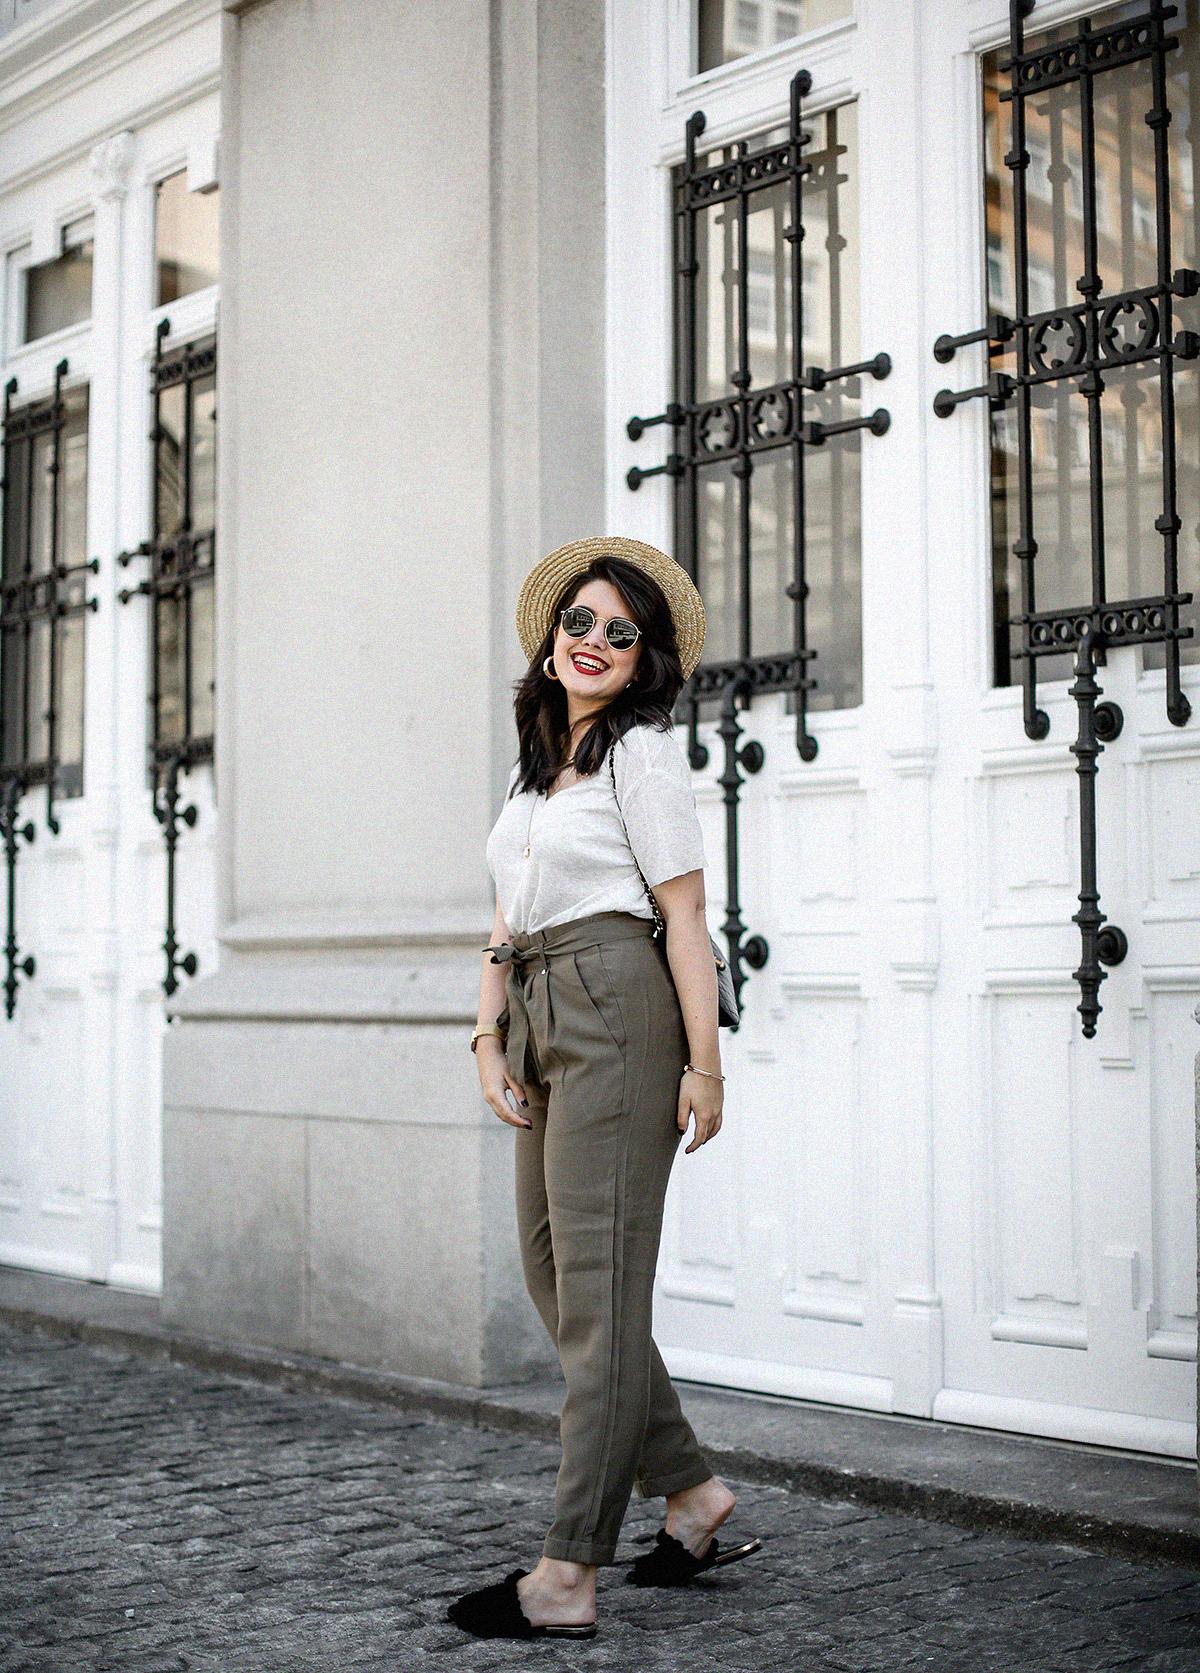 pantalones-verdes-altos-palas-borlas-zara-canotier-look-myblueberrynightsblog4